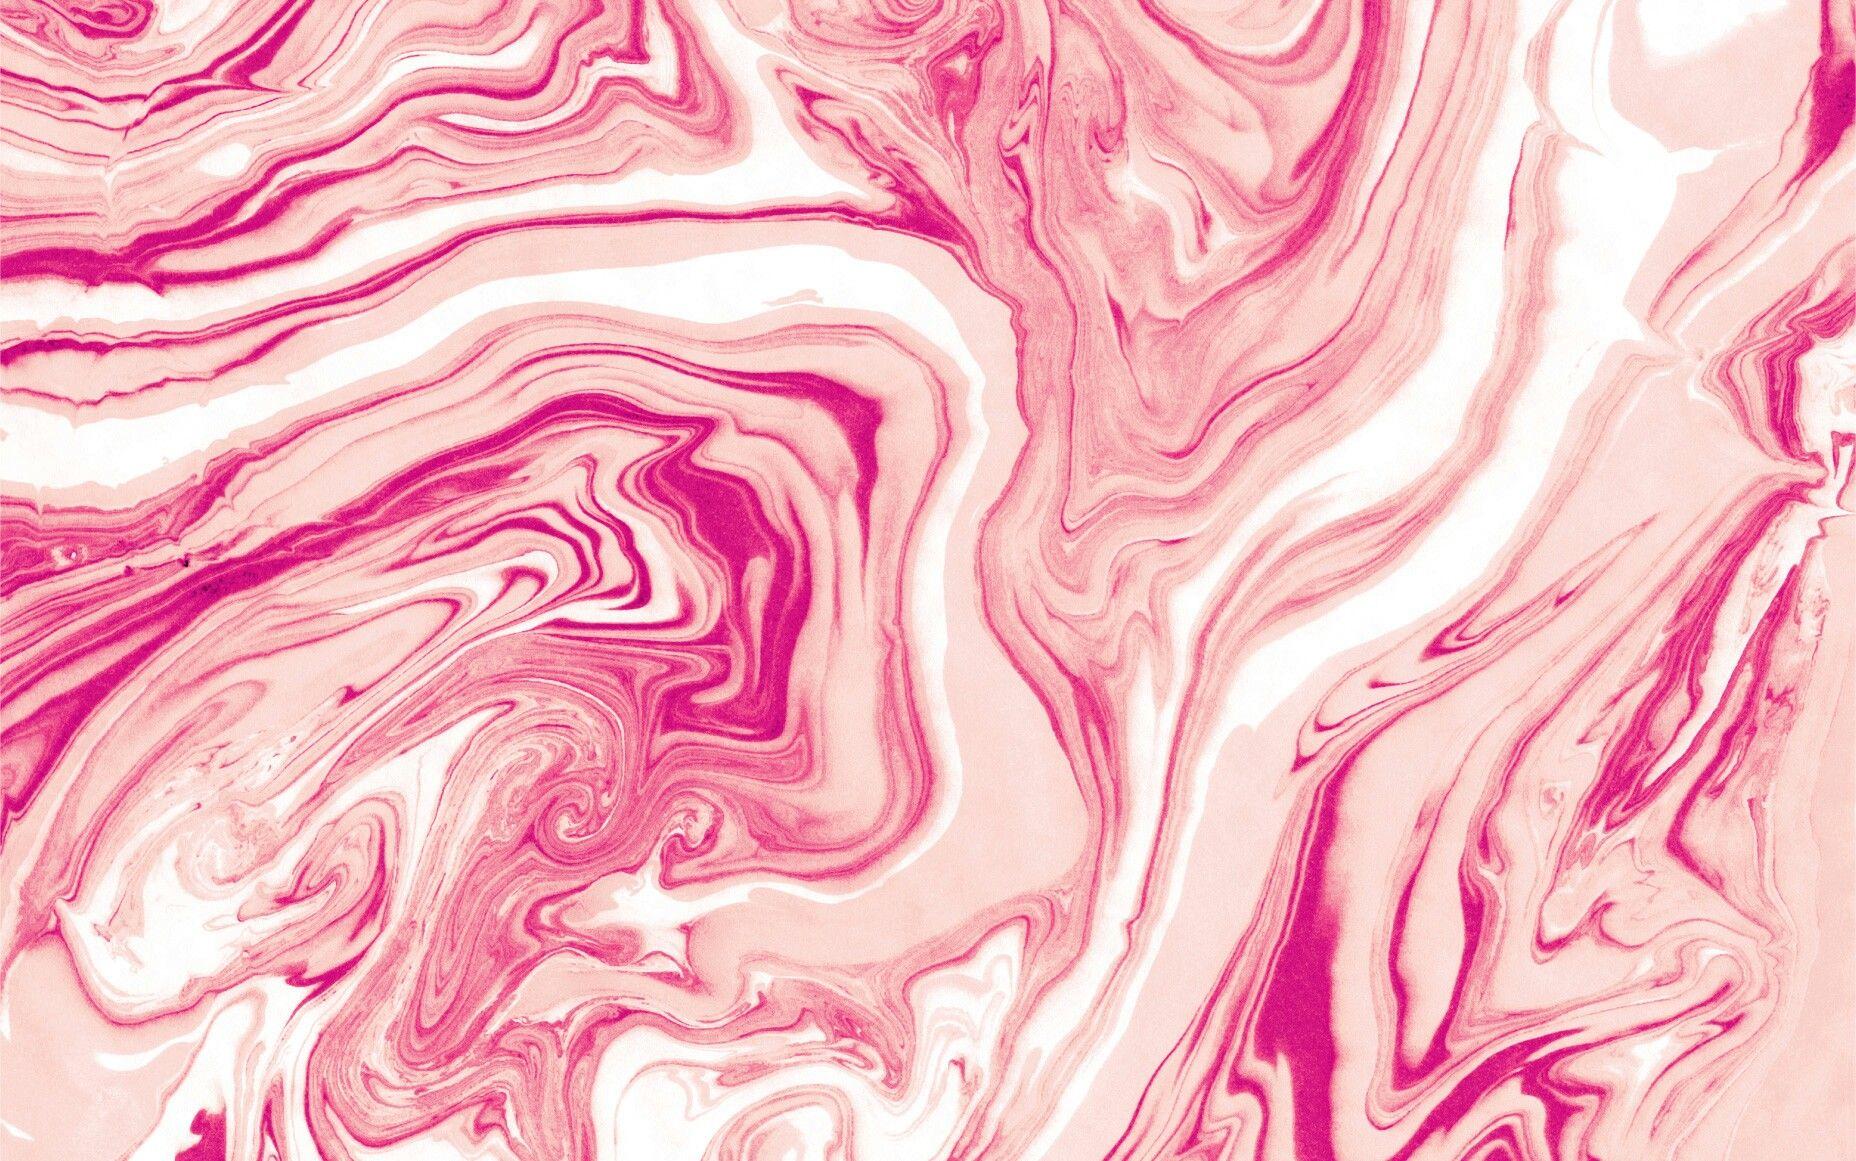 Pink Marble Cute Desktop Wallpaper Laptop Wallpaper Pink Marble Wallpaper